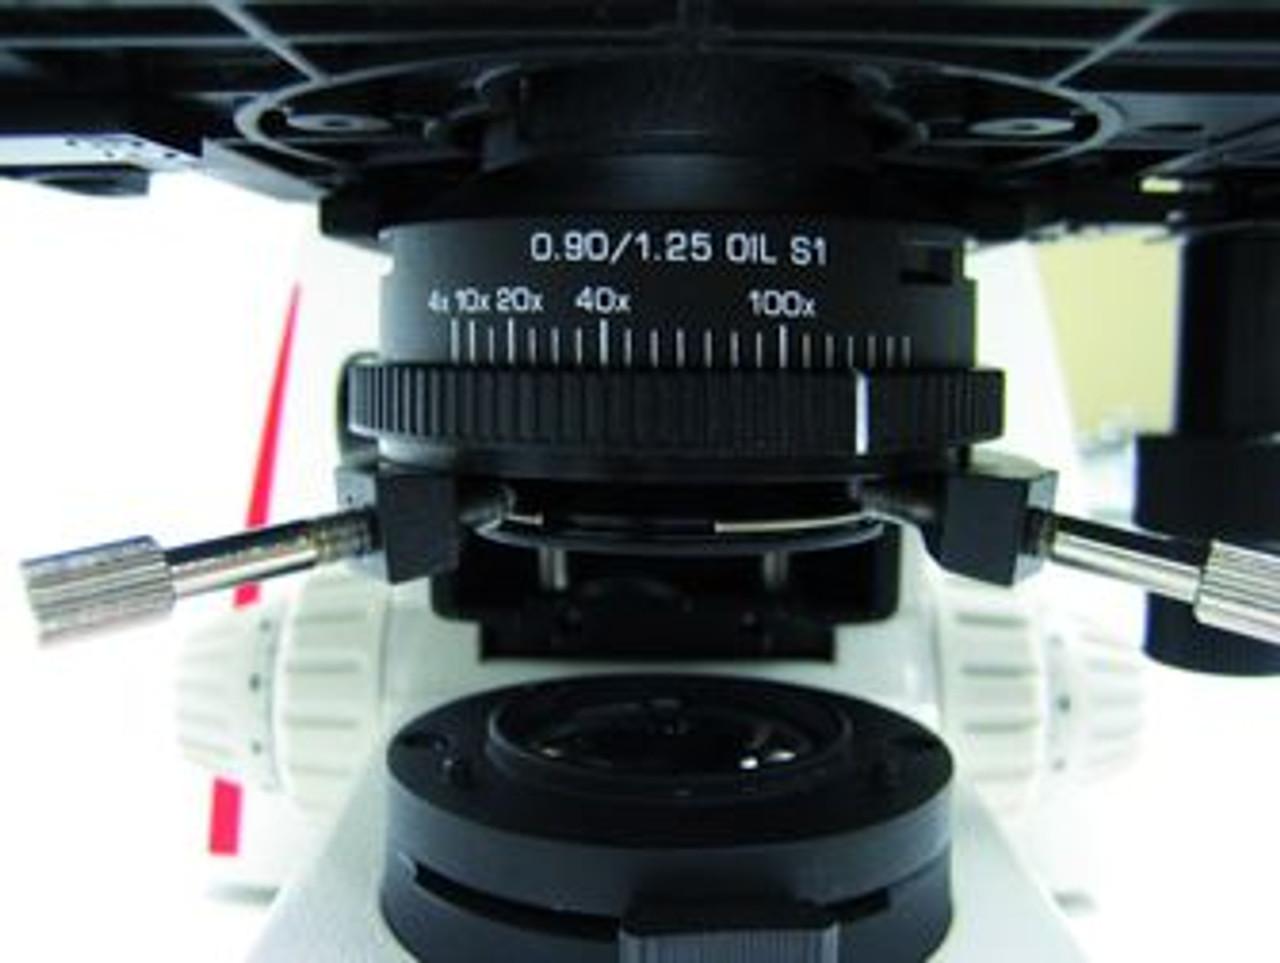 Leica DM750 Versatile Condenser mount